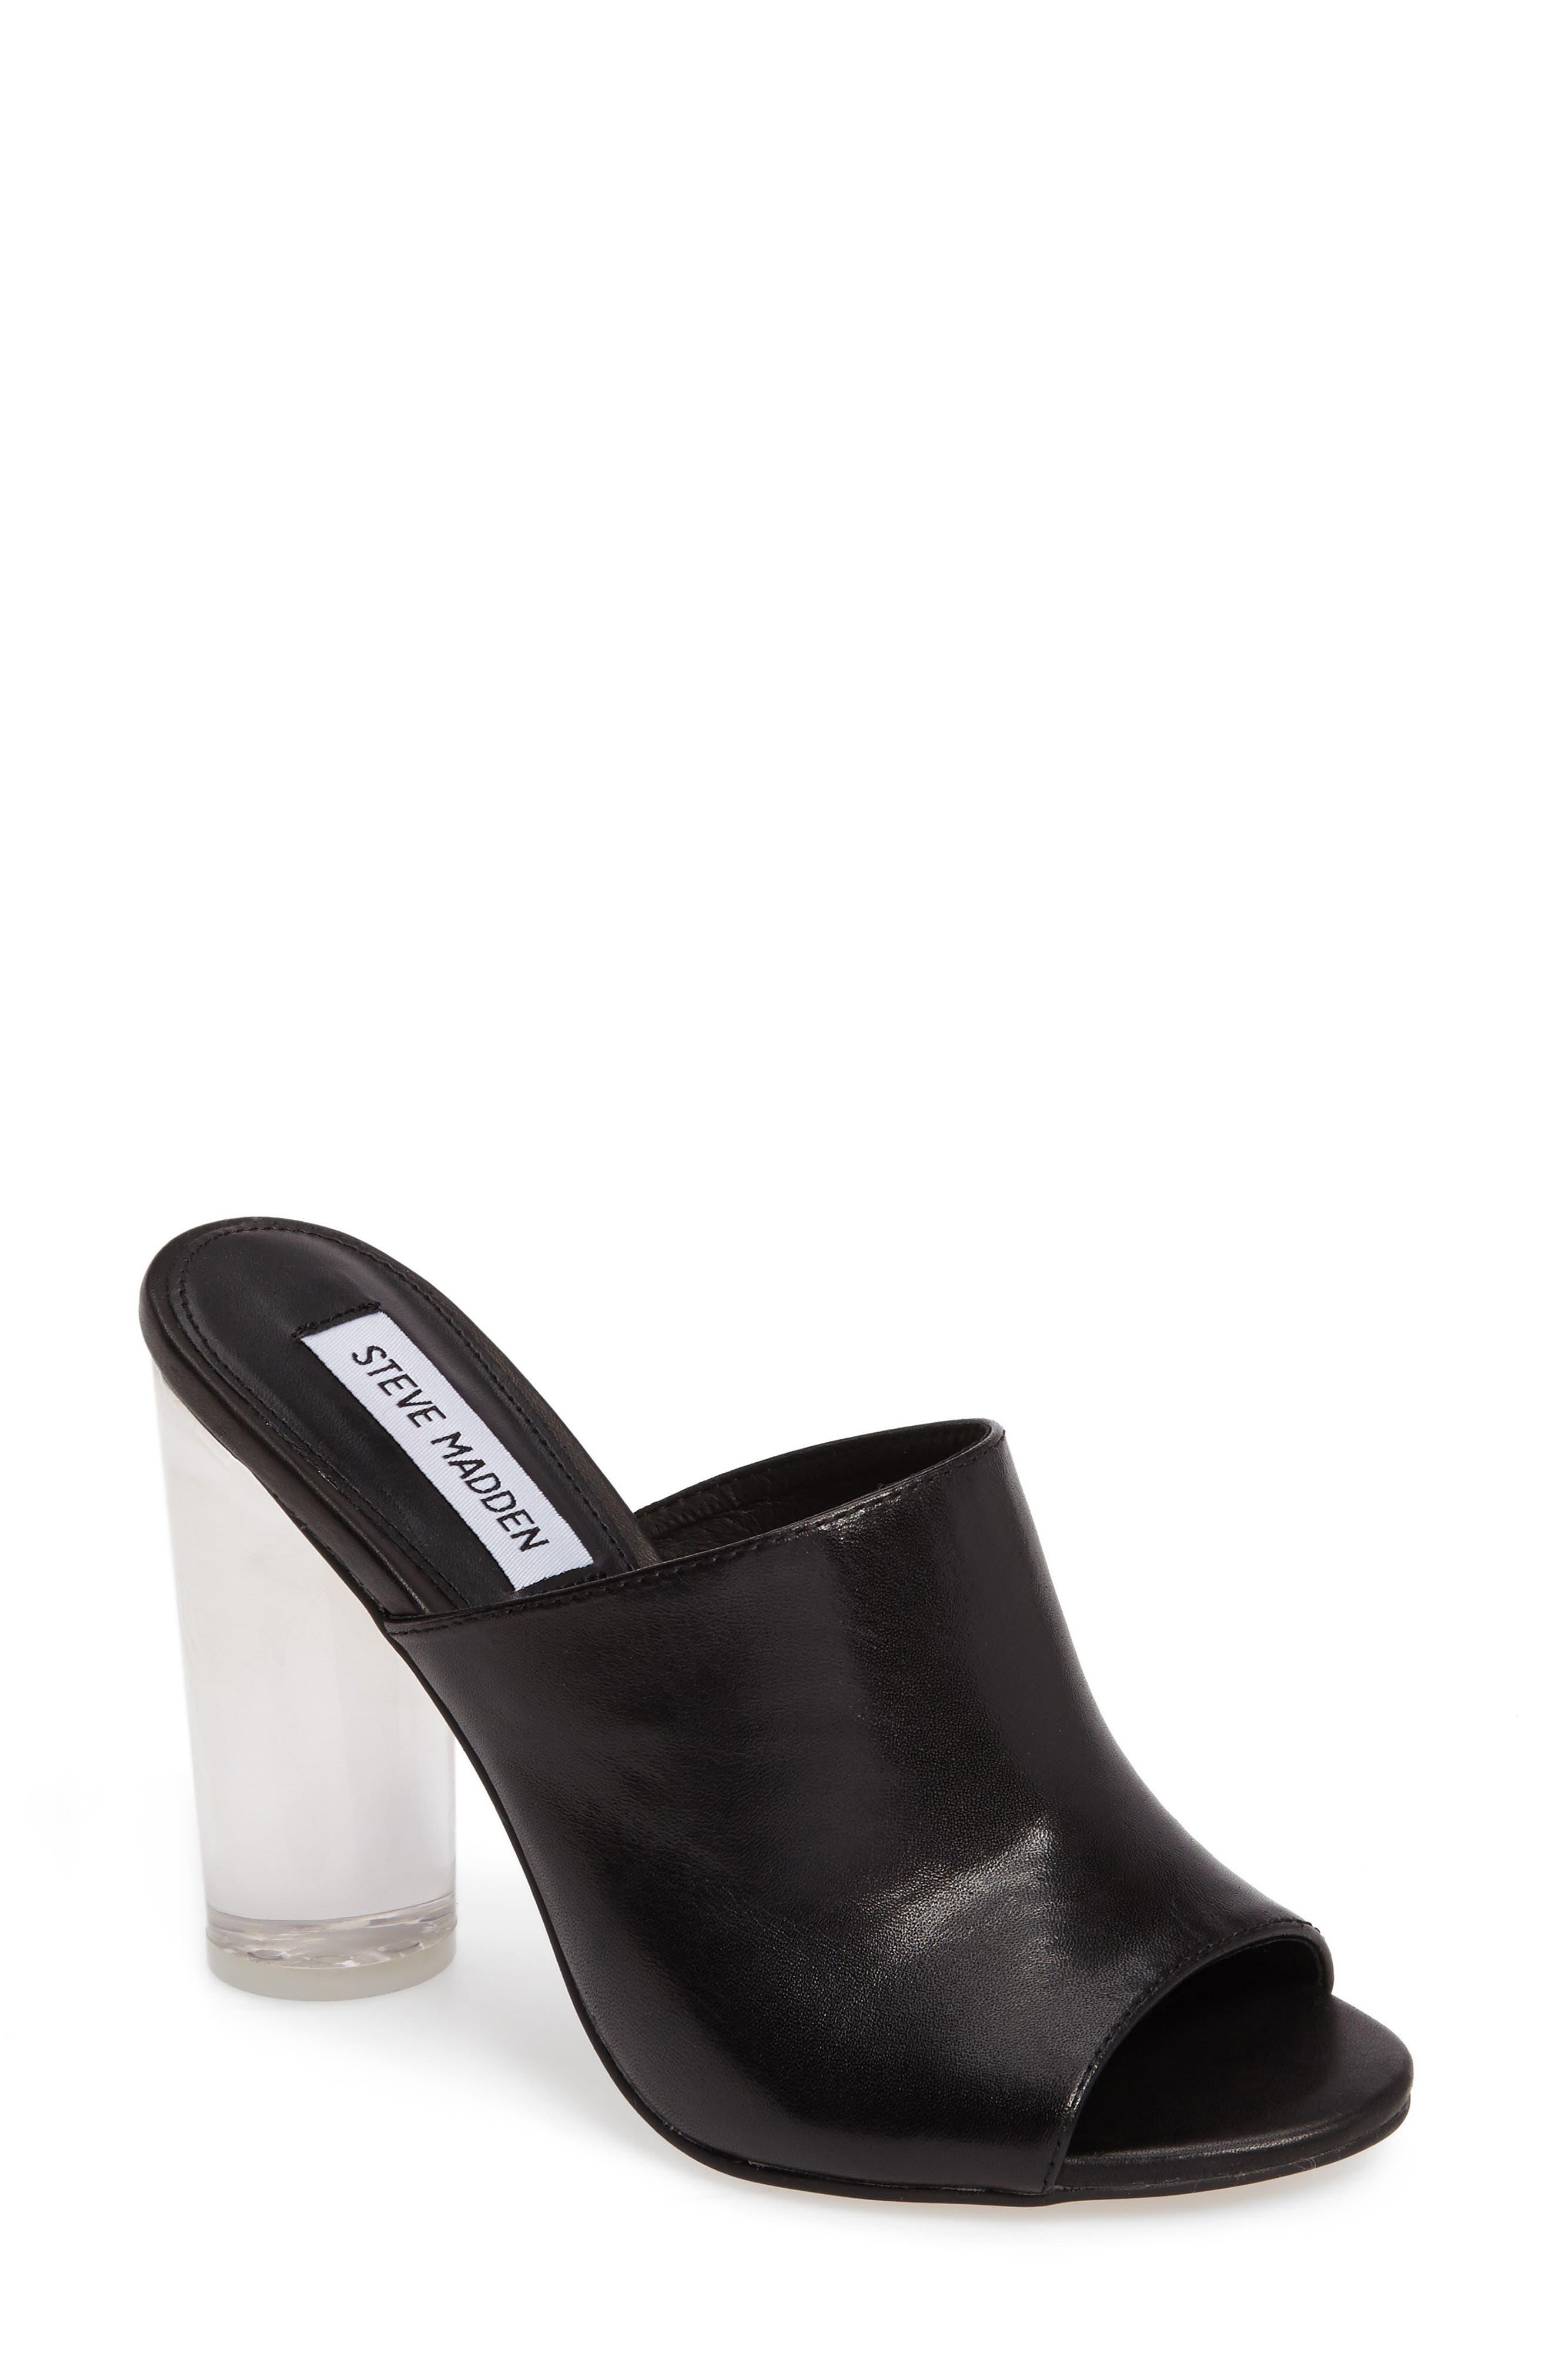 Main Image - Steve Madden Classics Mule Sandal (Women)